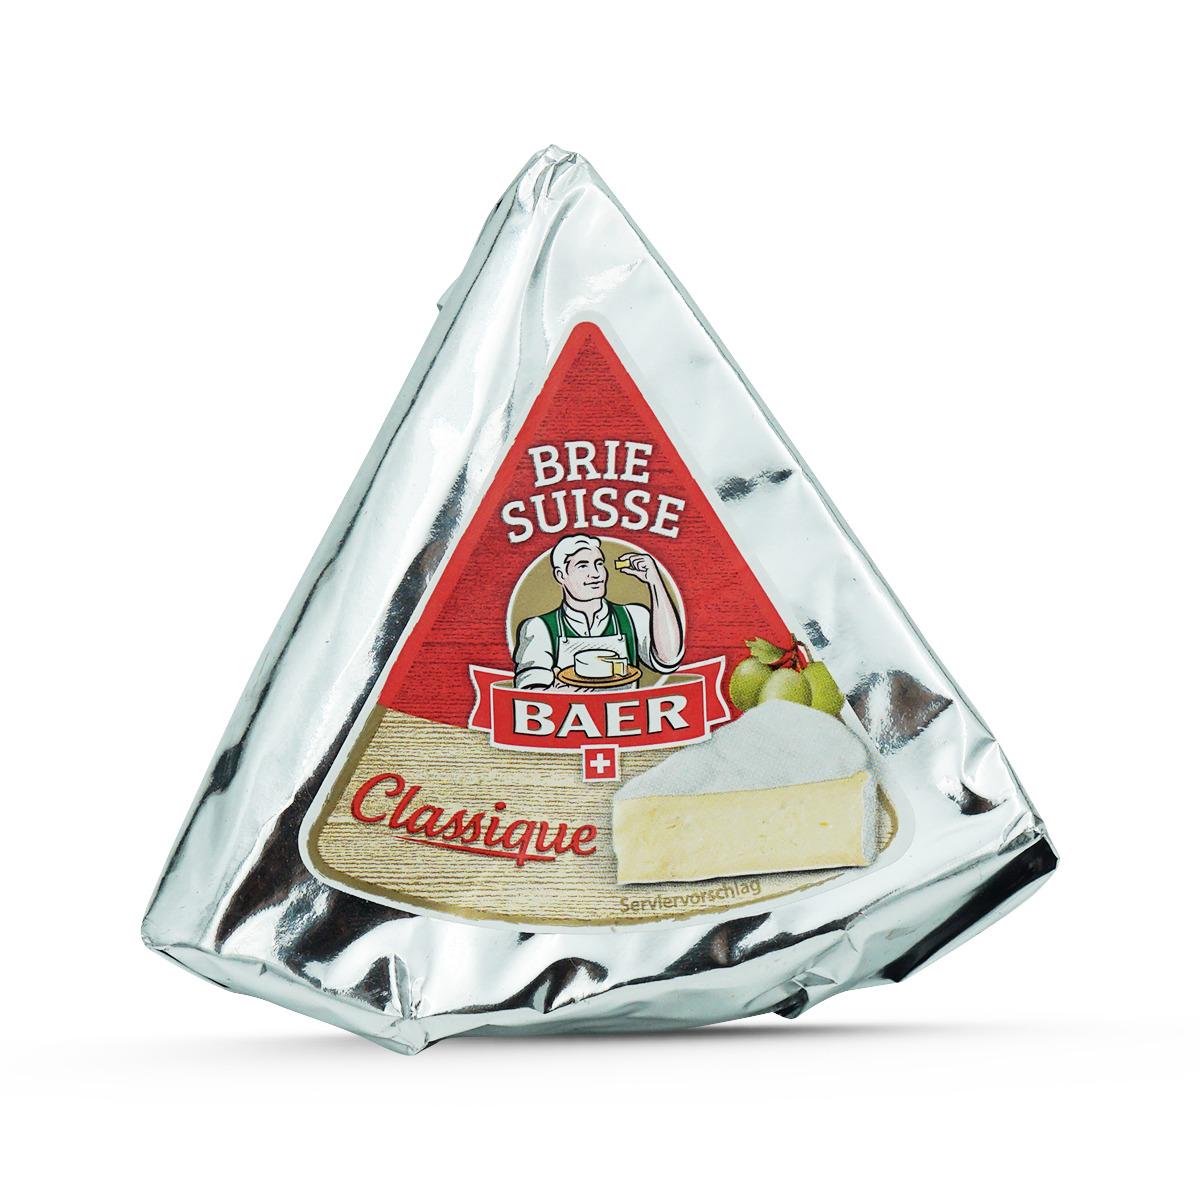 Baer Brie Suisse Classique